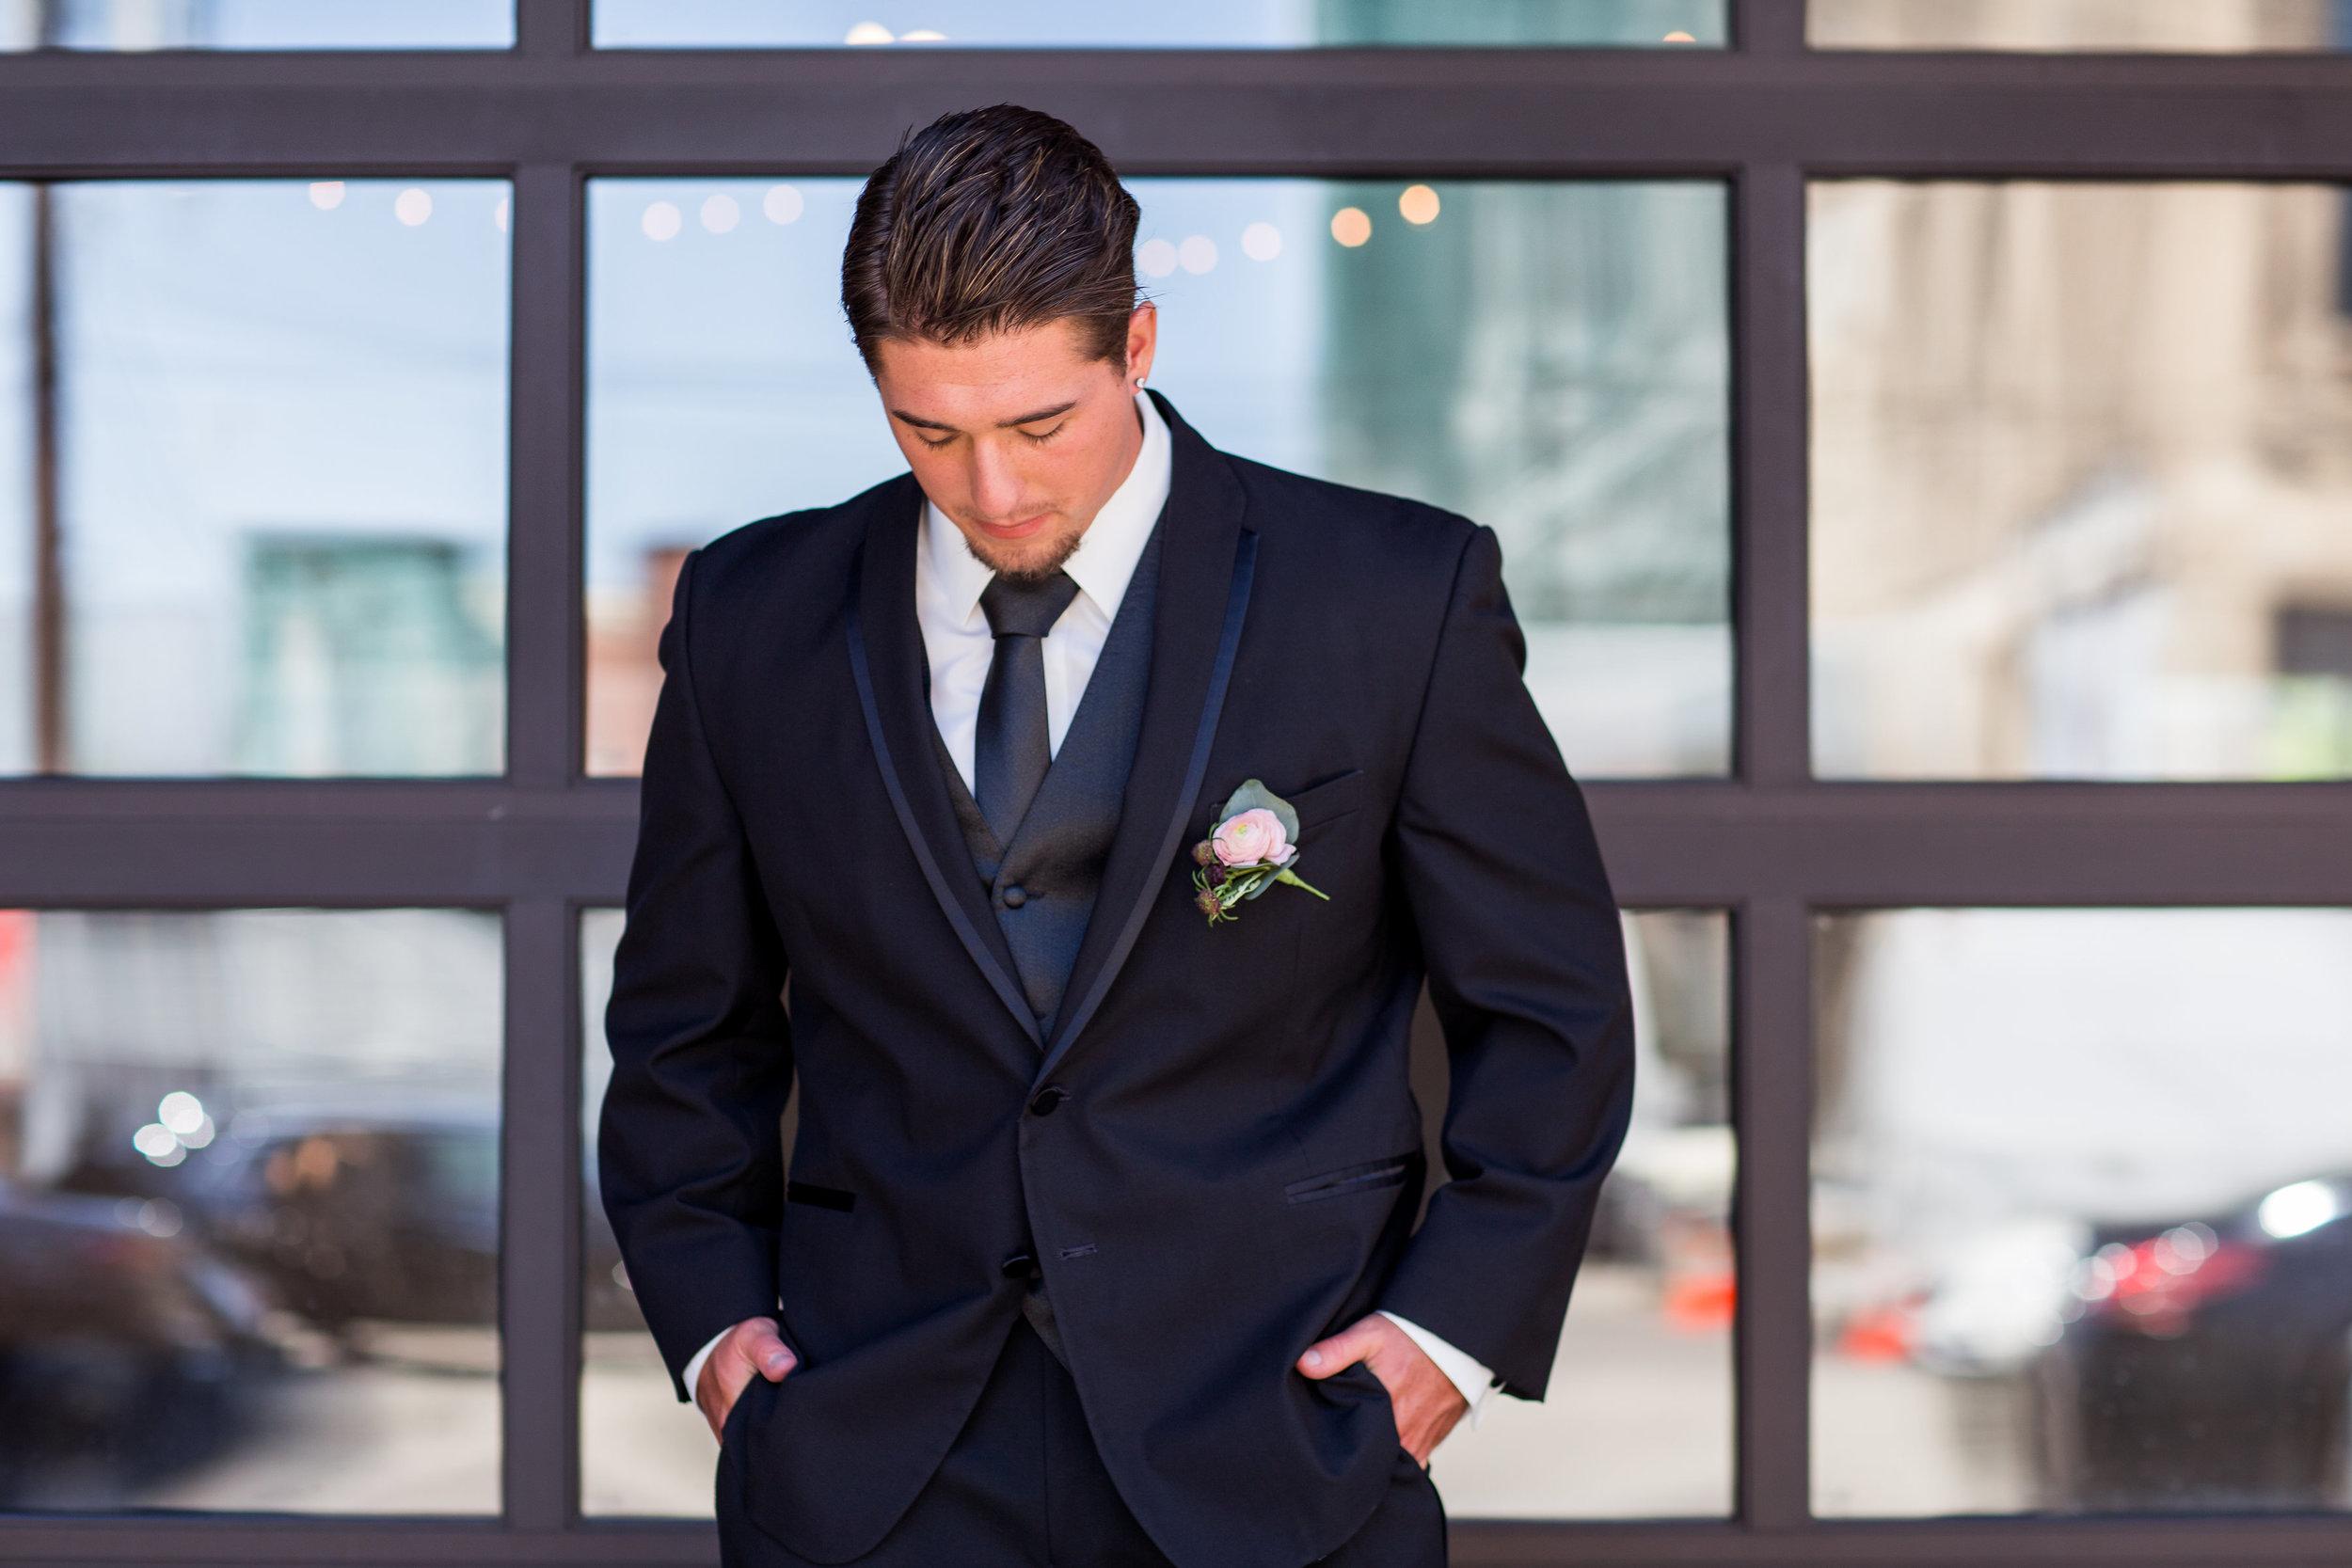 Wedding_Styled_Shoot_Minneapolis-135.jpg